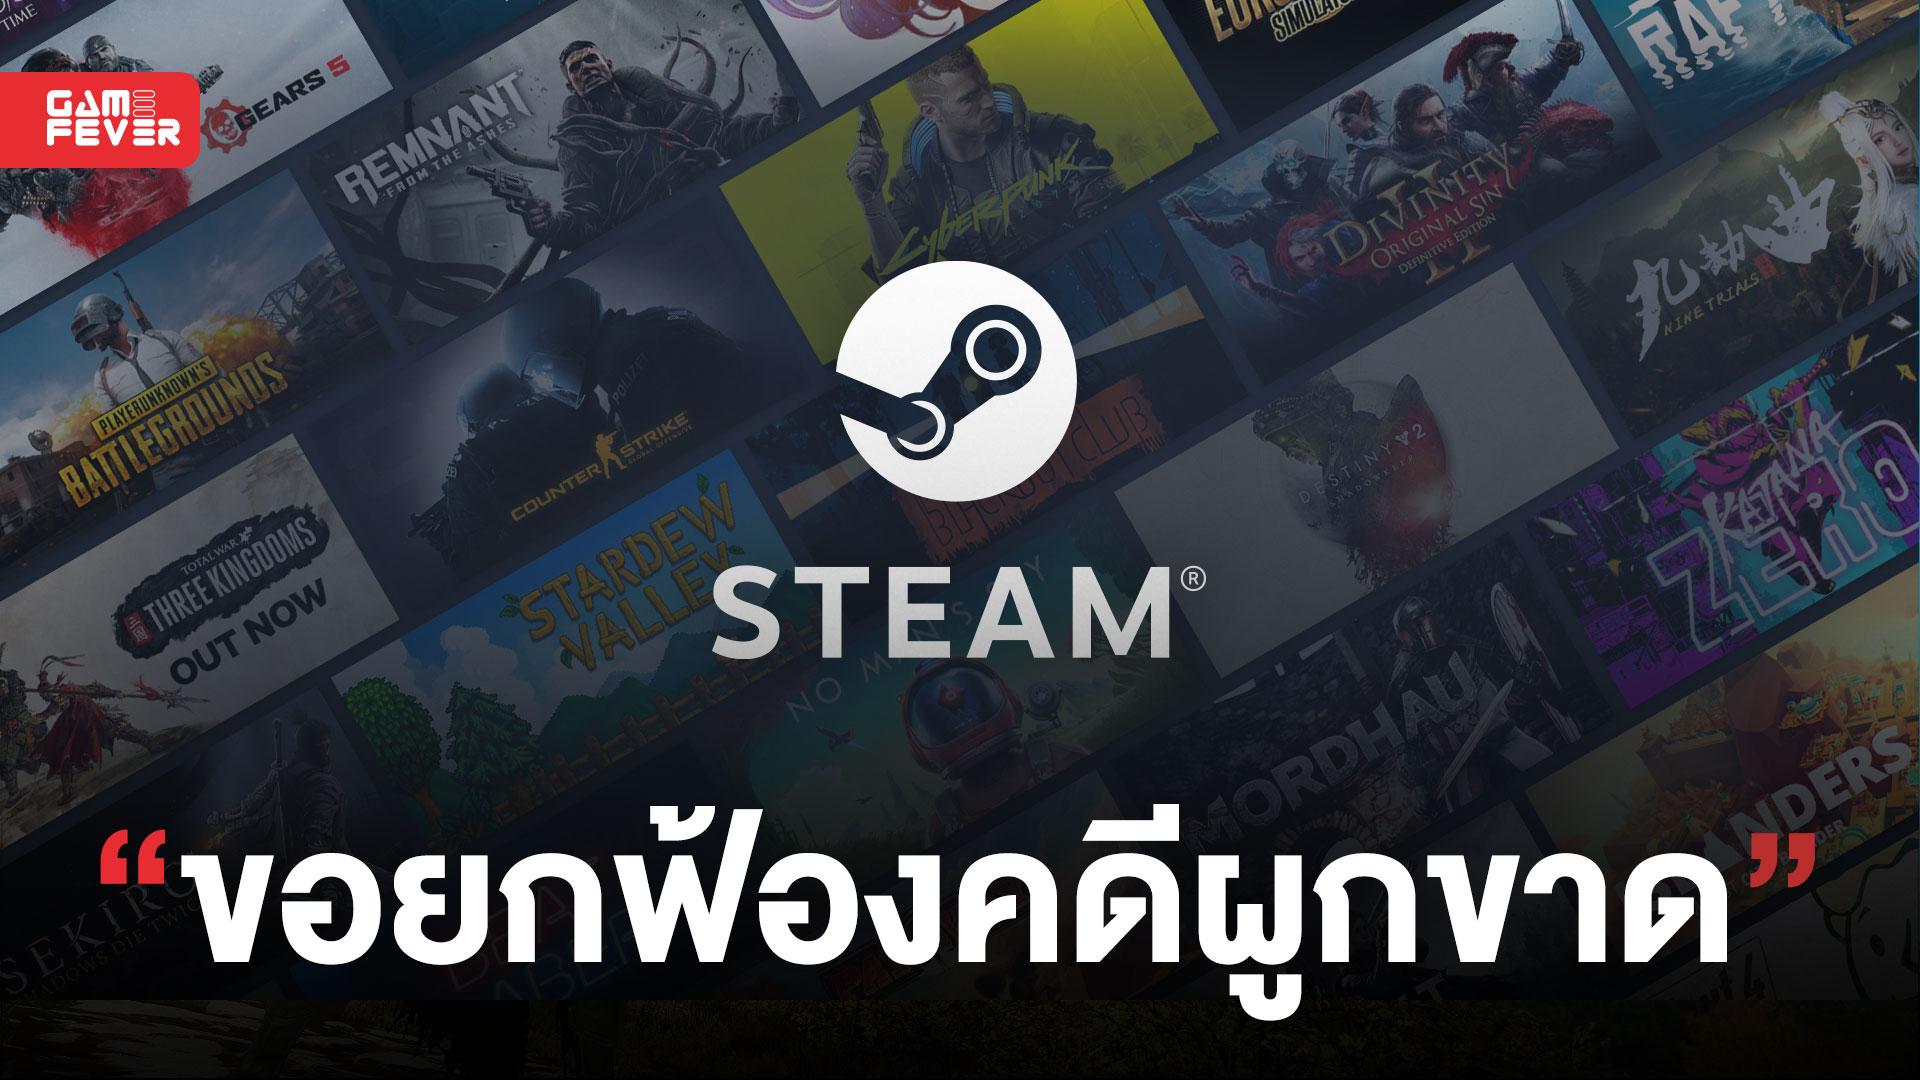 Valve ตอบโต้คดีผูกขาดและส่วนแบ่ง 30% ของ Steam